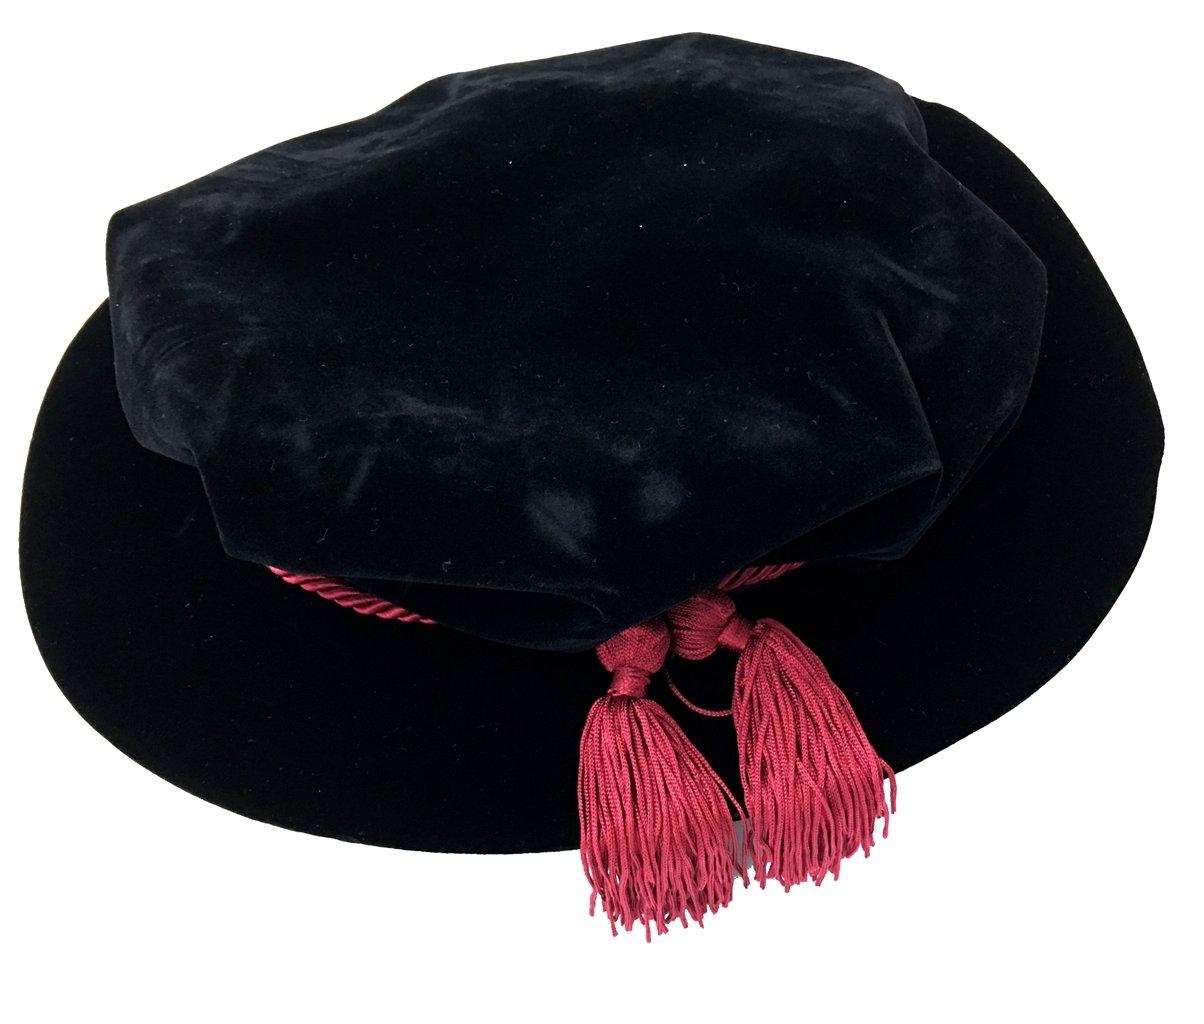 Black Velvet Tudor Beefeater Style Maroon Tassel Bonnet - DeluxeAdultCostumes.com